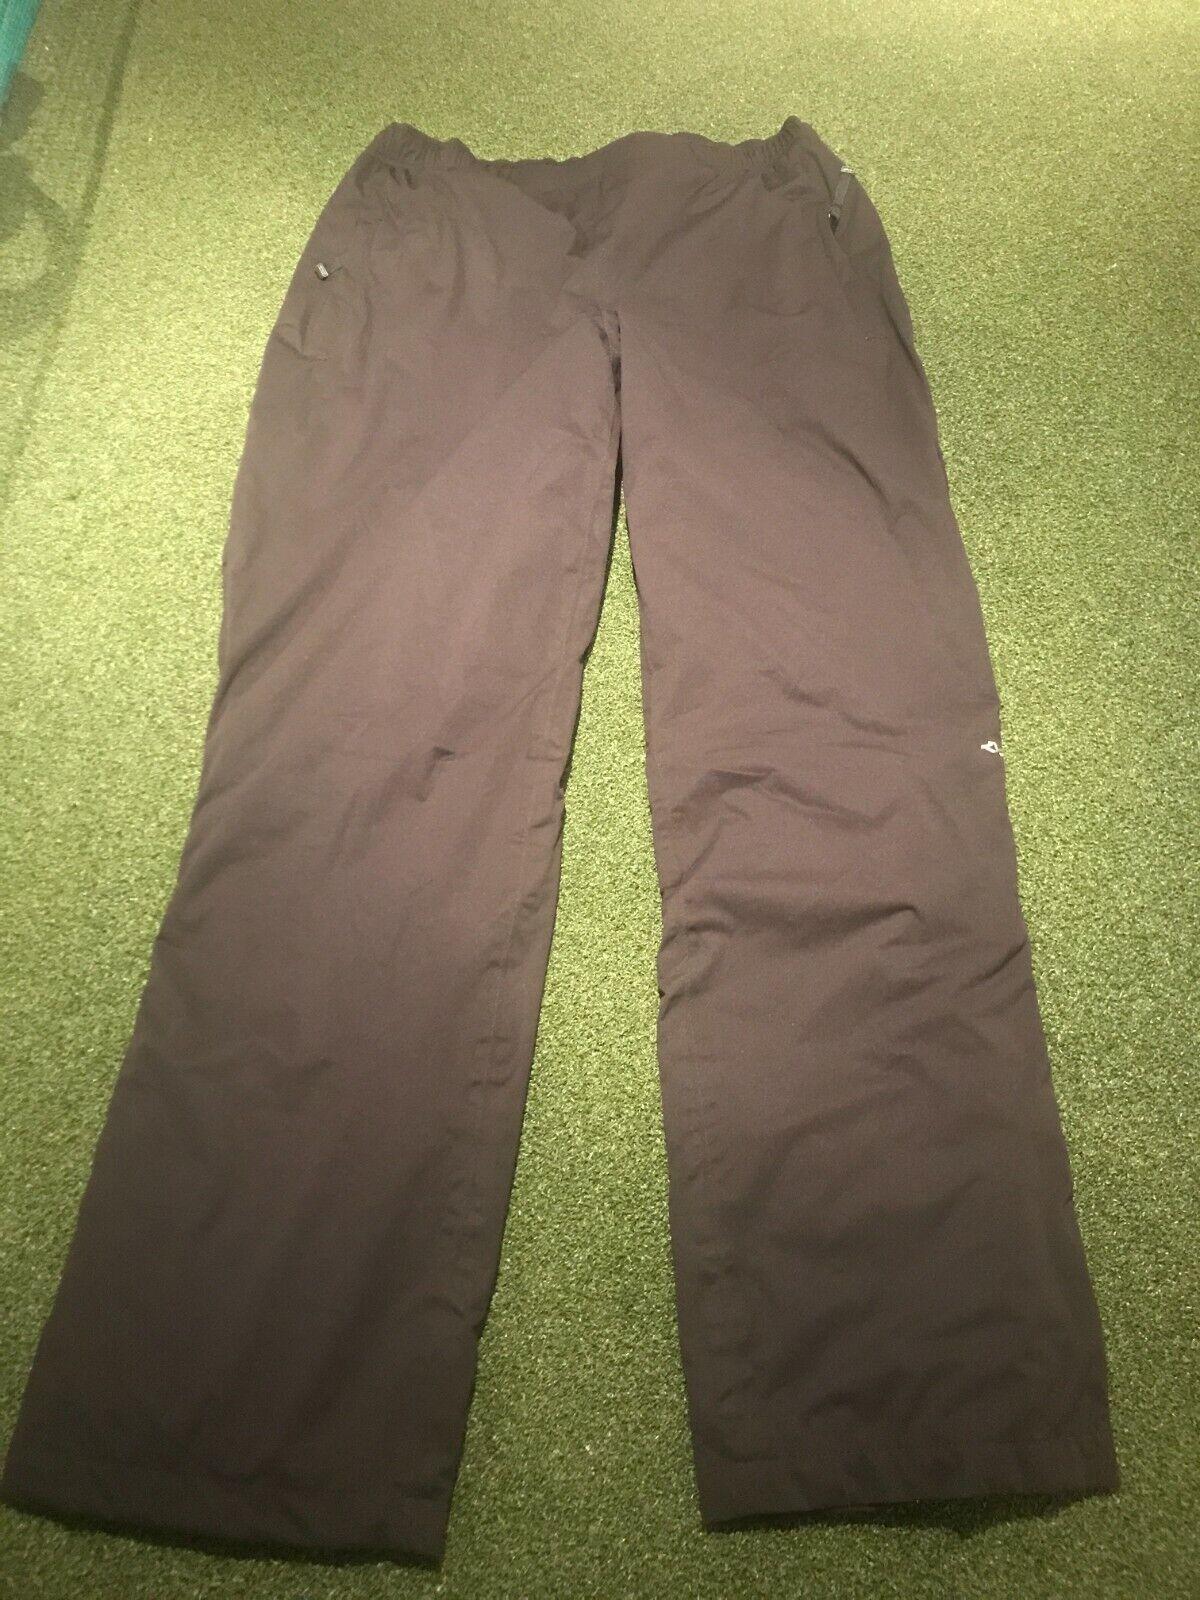 Röhnisch Golf Regenhose für Damen Gr. XL